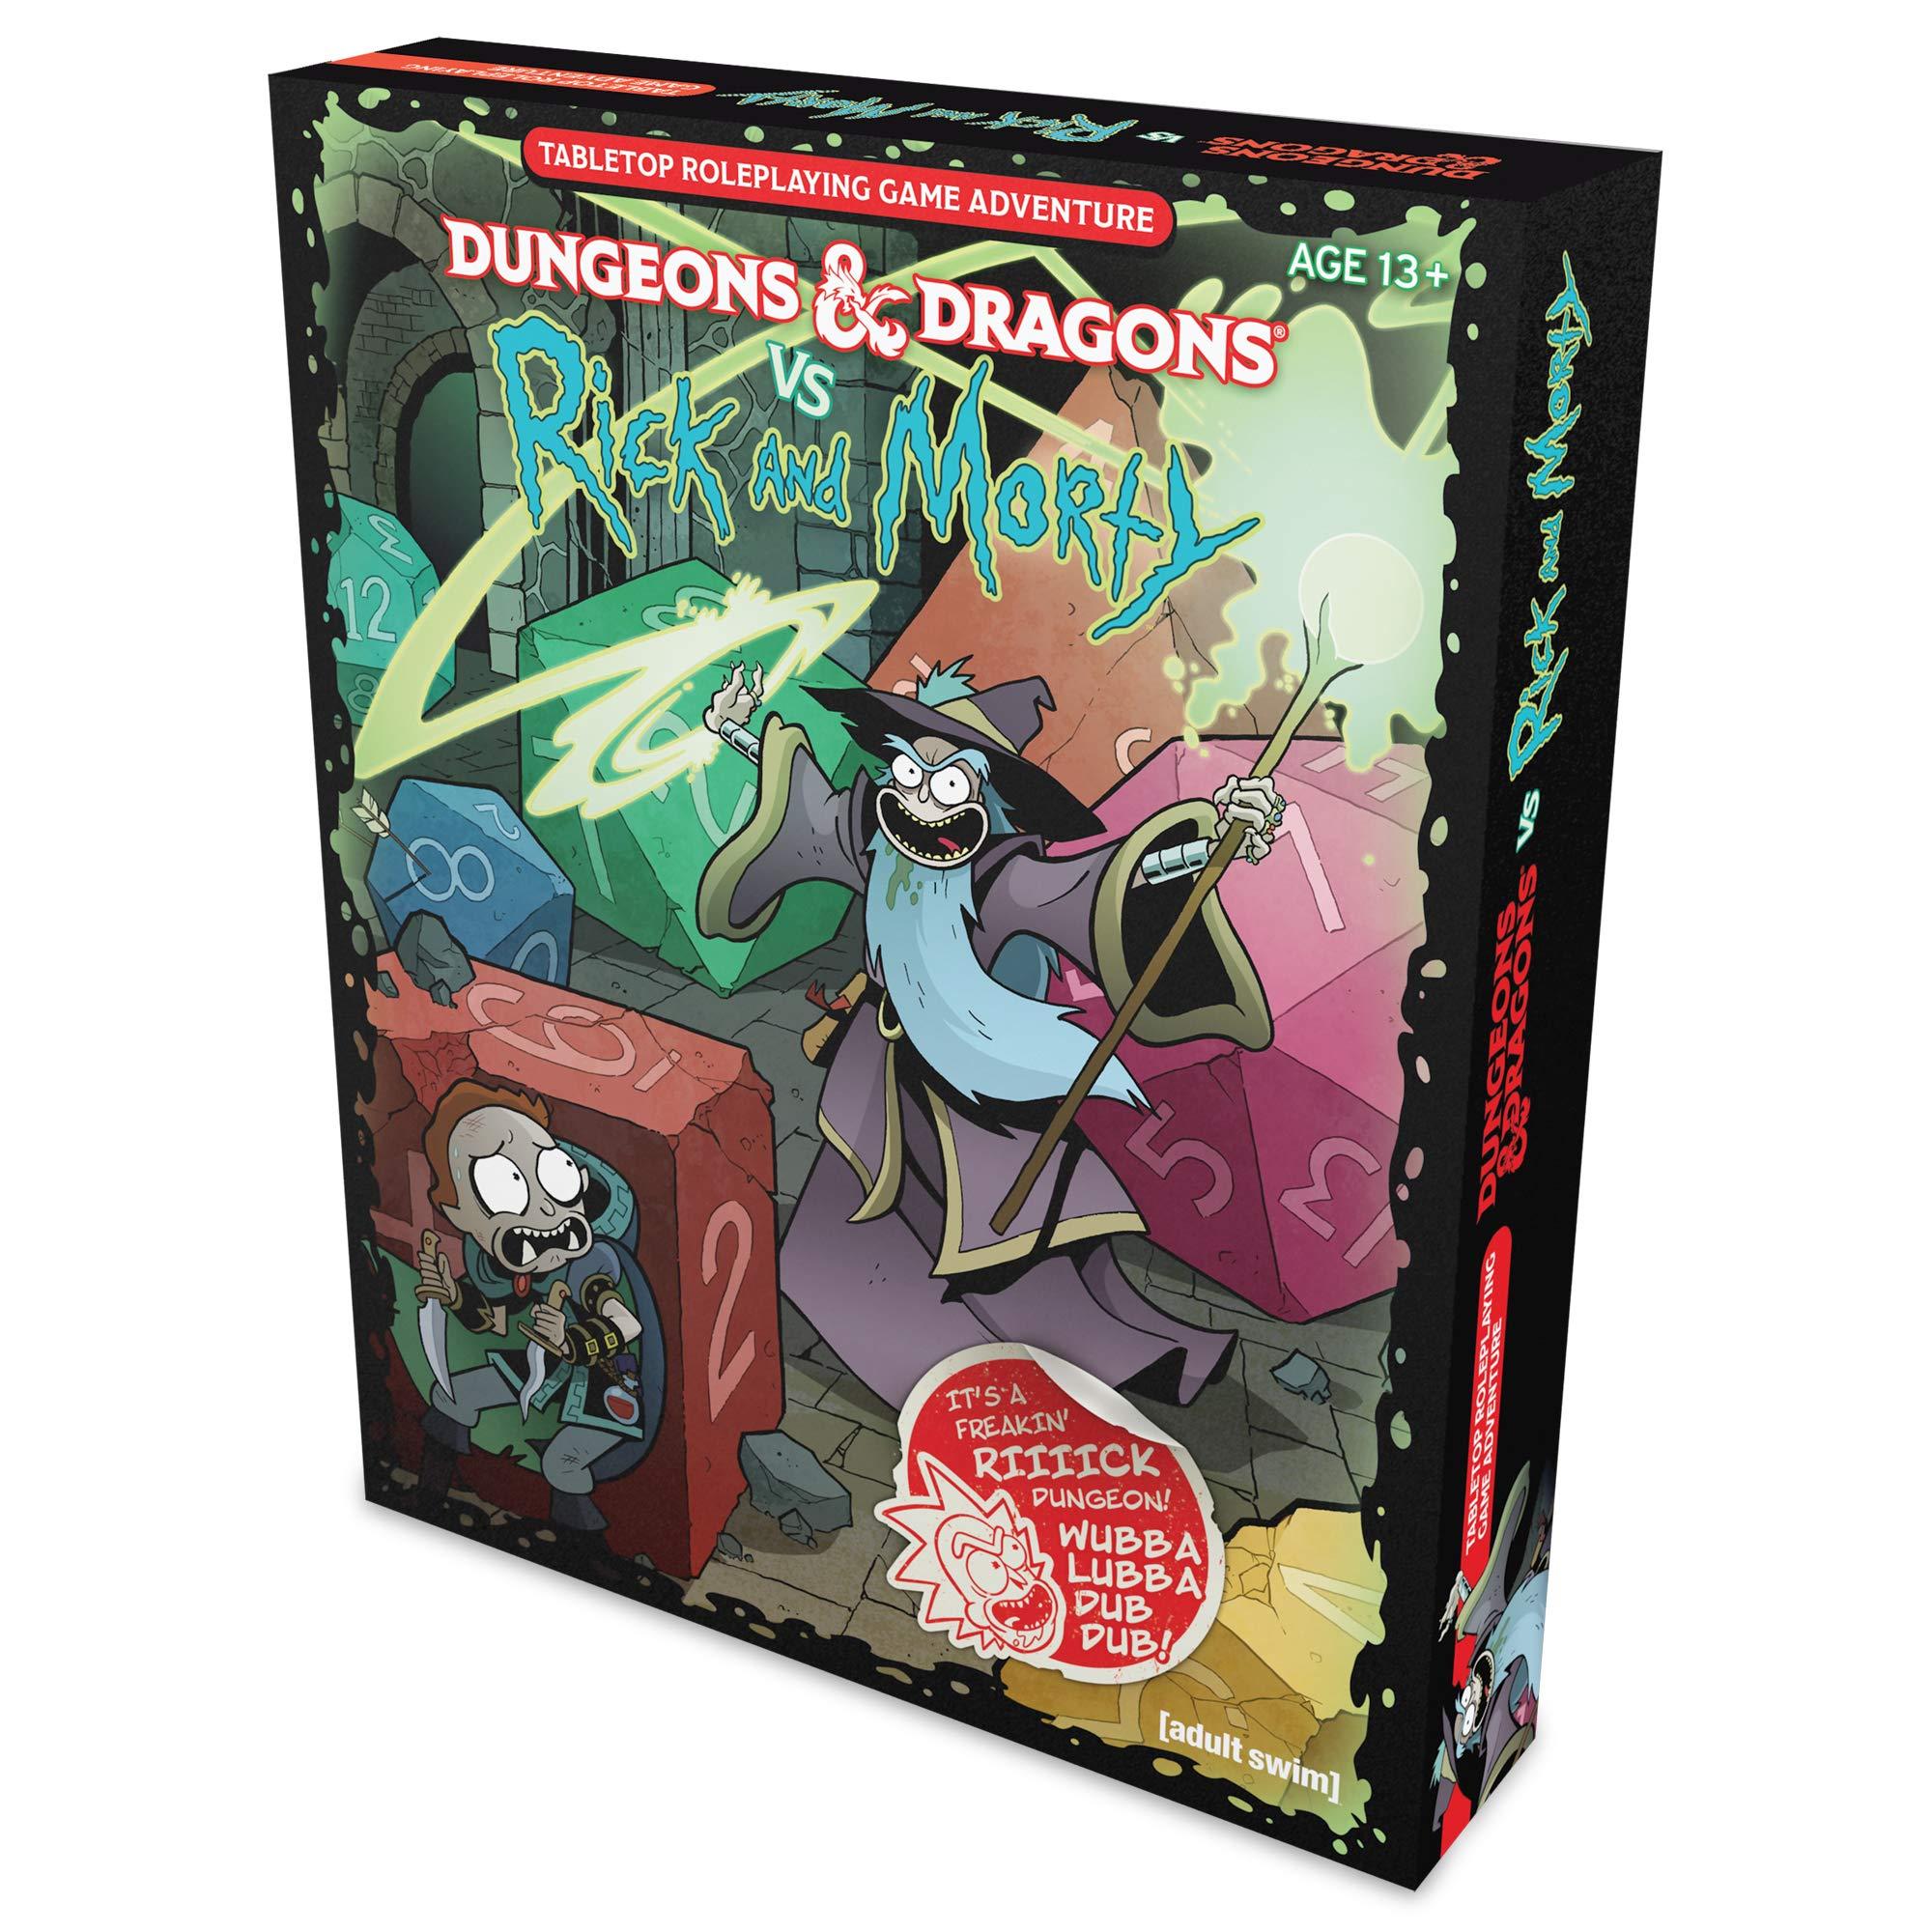 D&D RPG RICK & MORTY TABLETOP RPG: Amazon.es: Wizards Rpg Team ...